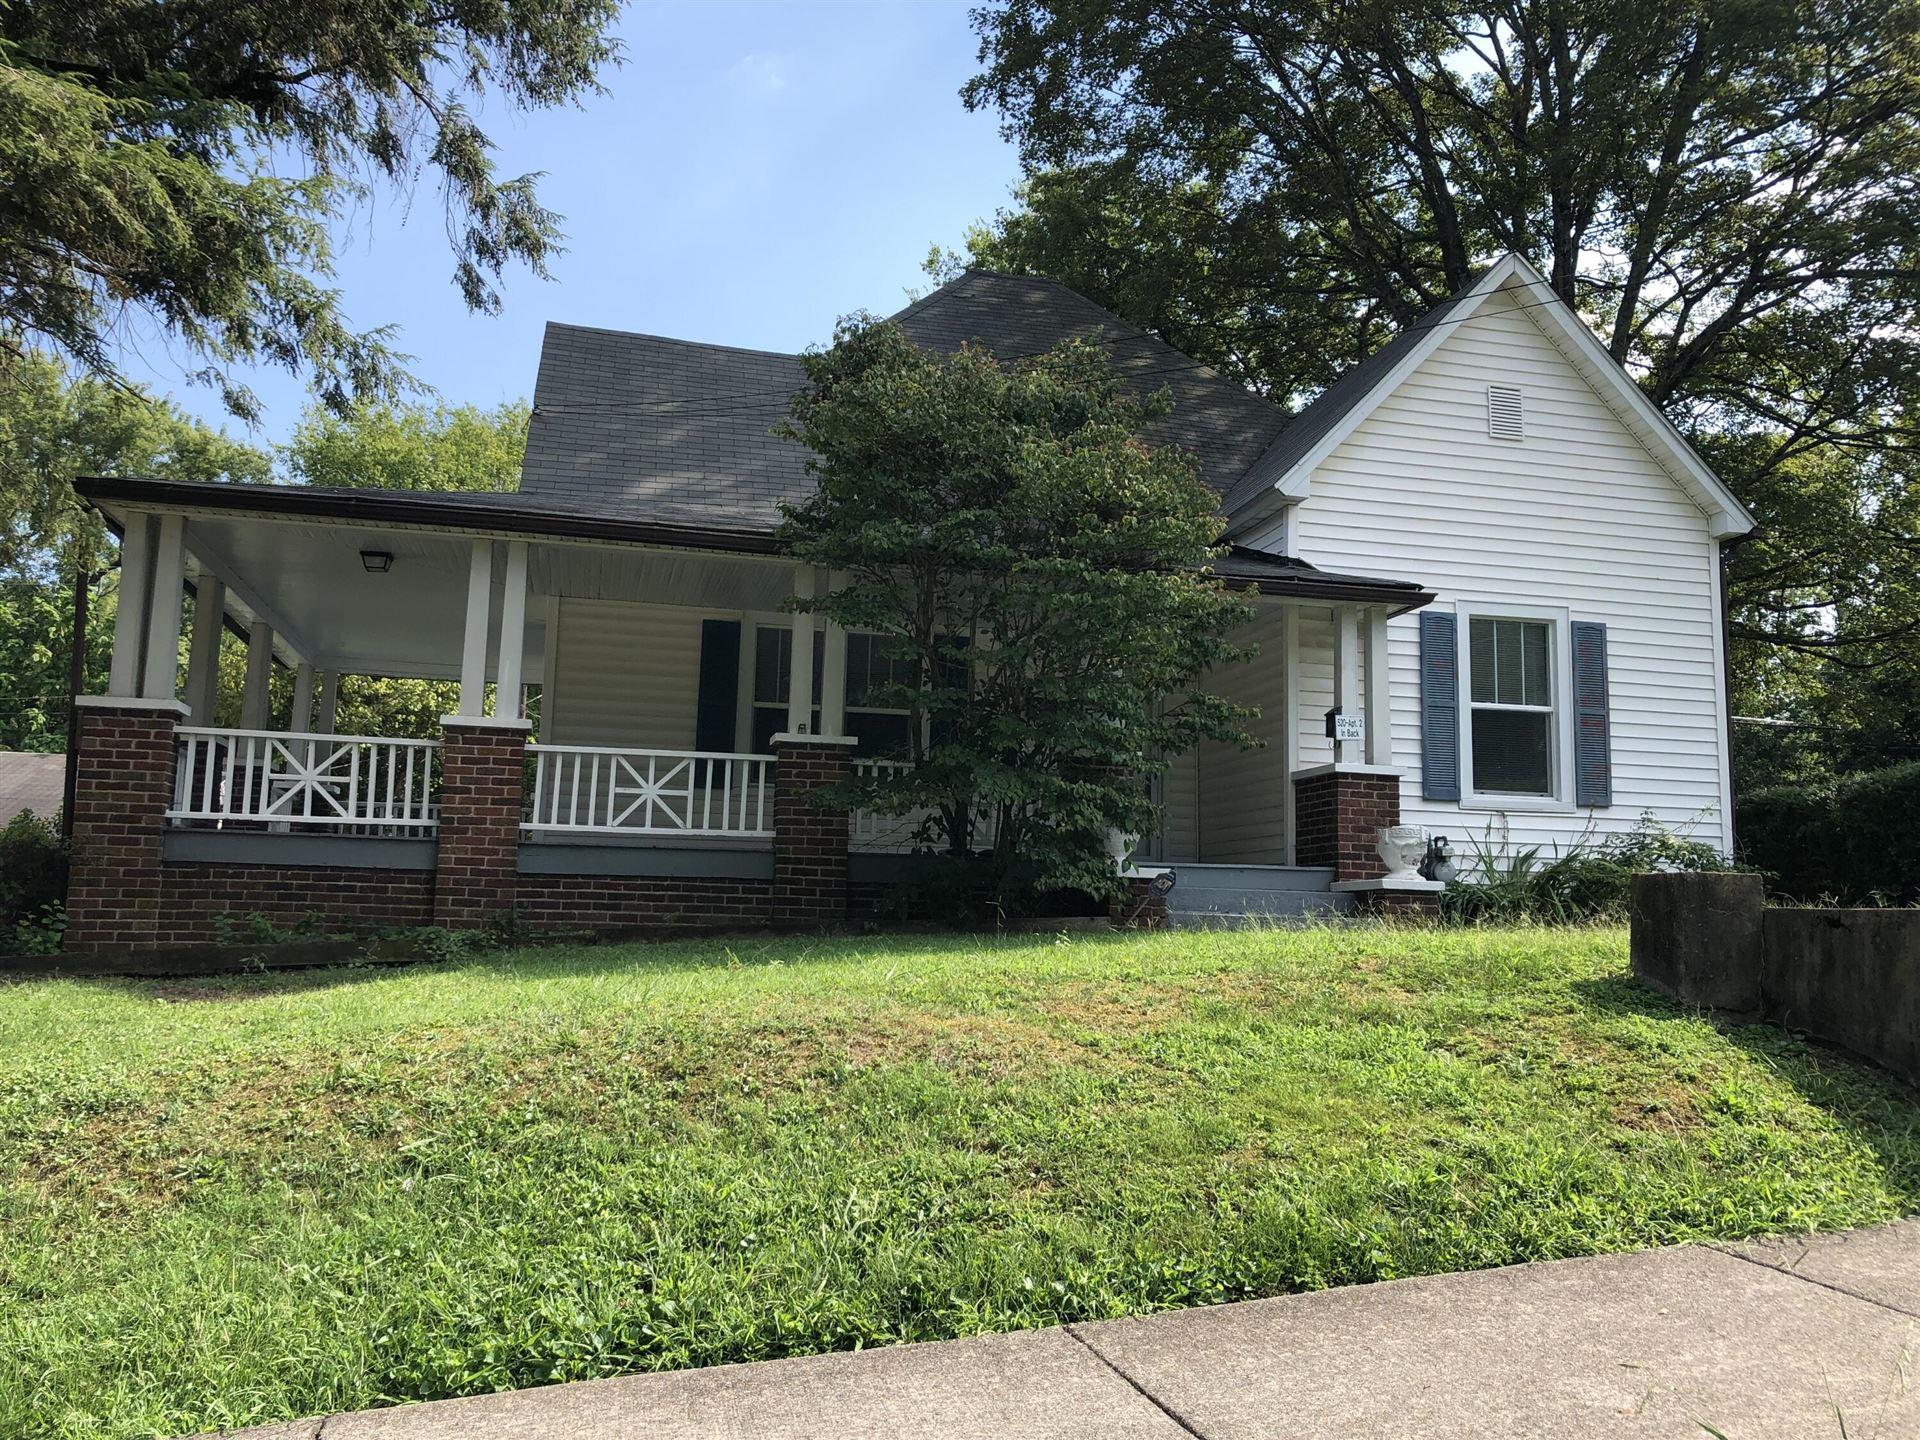 Photo of 520 Chickamauga Ave #APT 1, Knoxville, TN 37917 (MLS # 1168587)